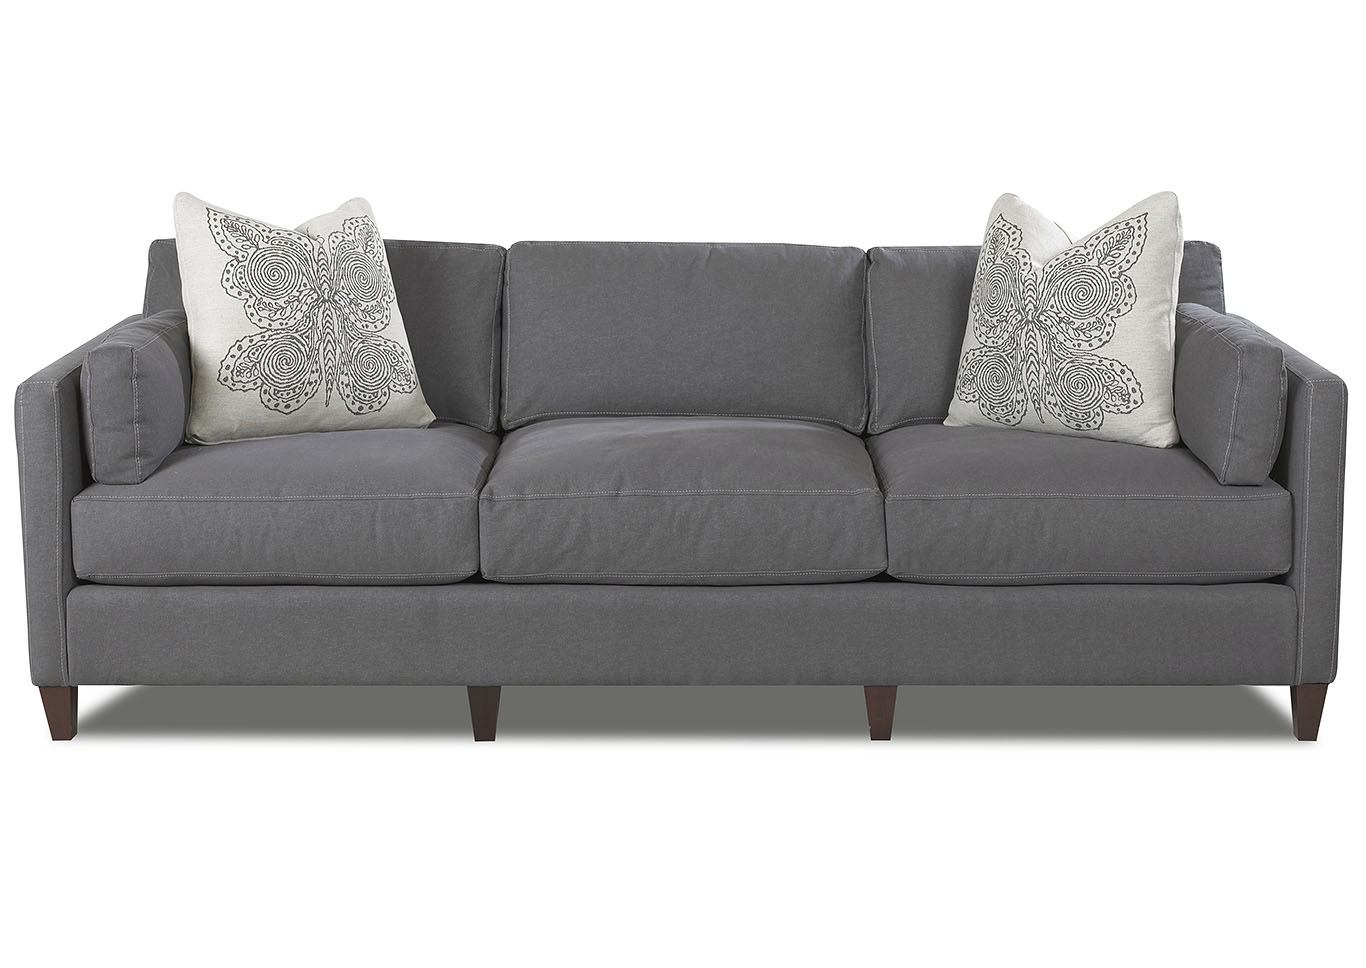 Genial Jordan Classic Gray Stationary Fabric Sofa,Klaussner Home Furnishings